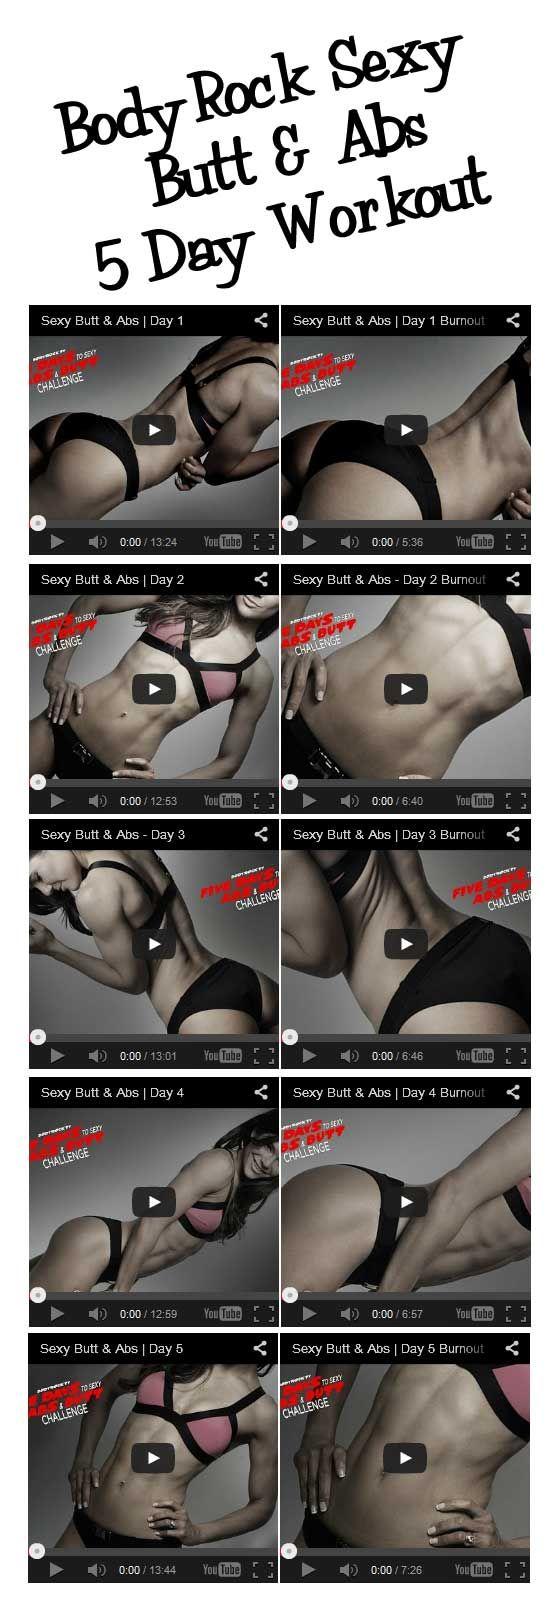 BodyRock Sexy Butt & Abs 5 Day Workout, plus burnouts.